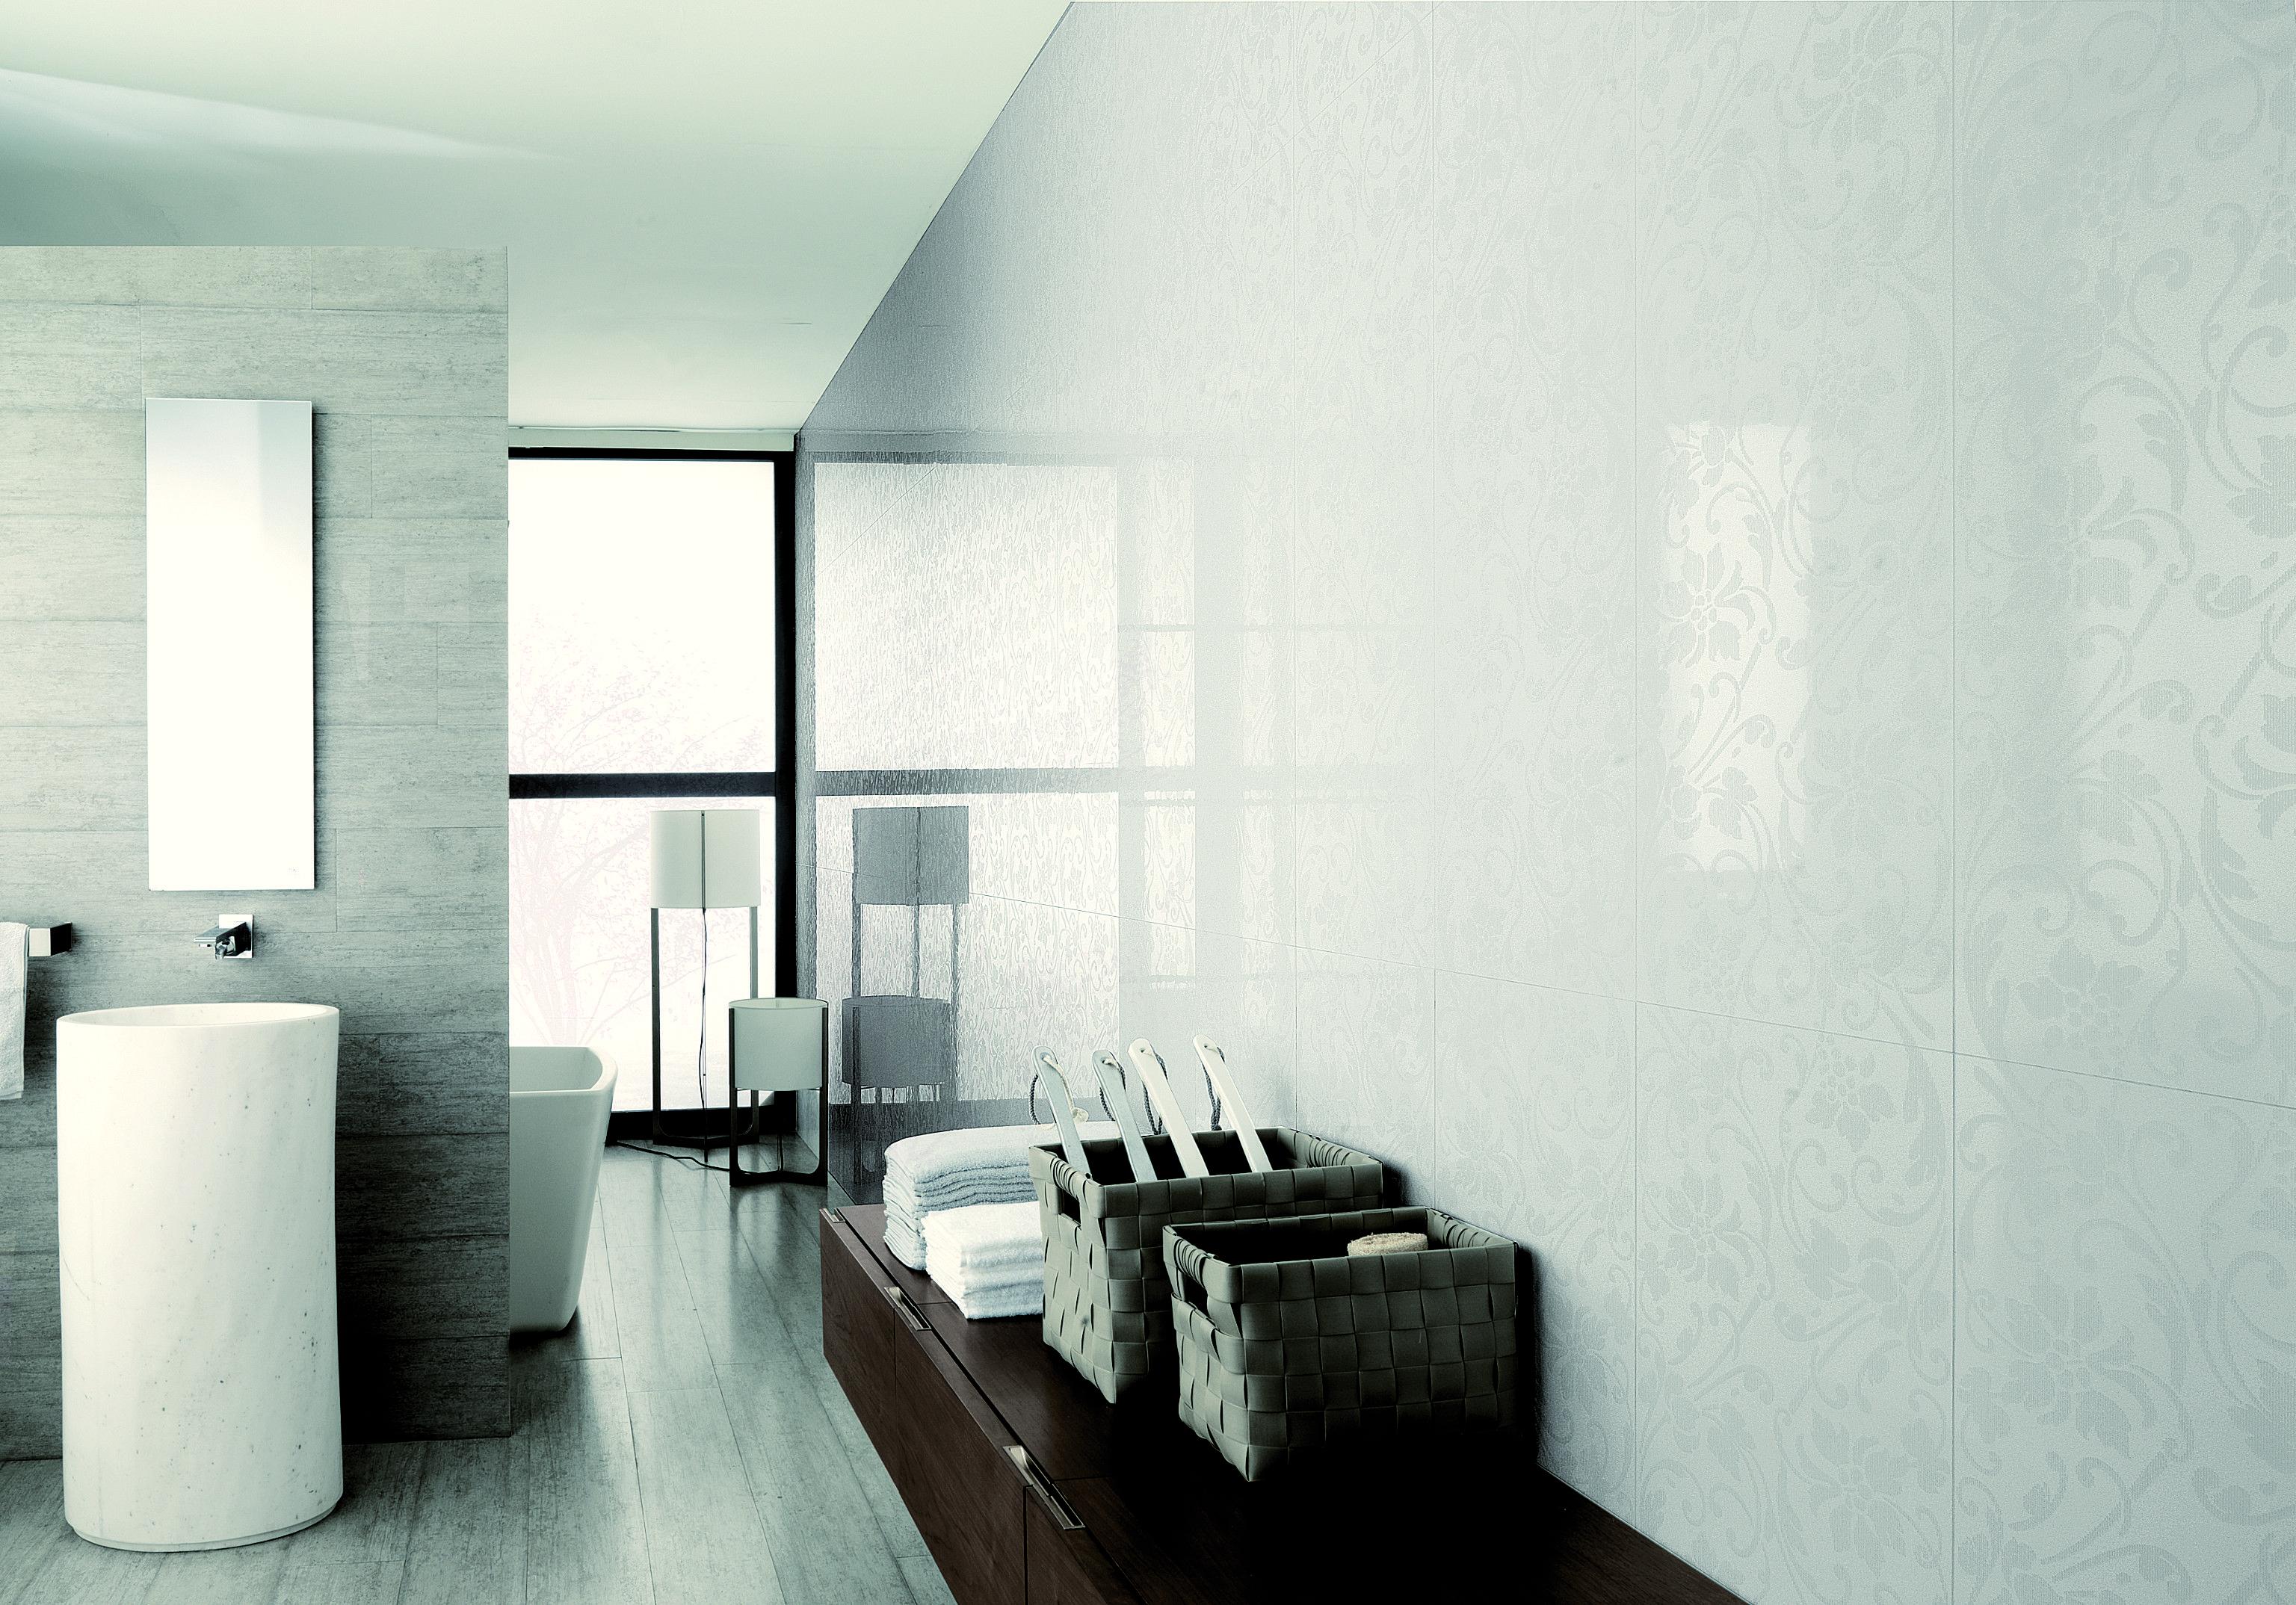 Venis \'Deco Crystal White\' Tile | Etched Intricate Floral Design ...